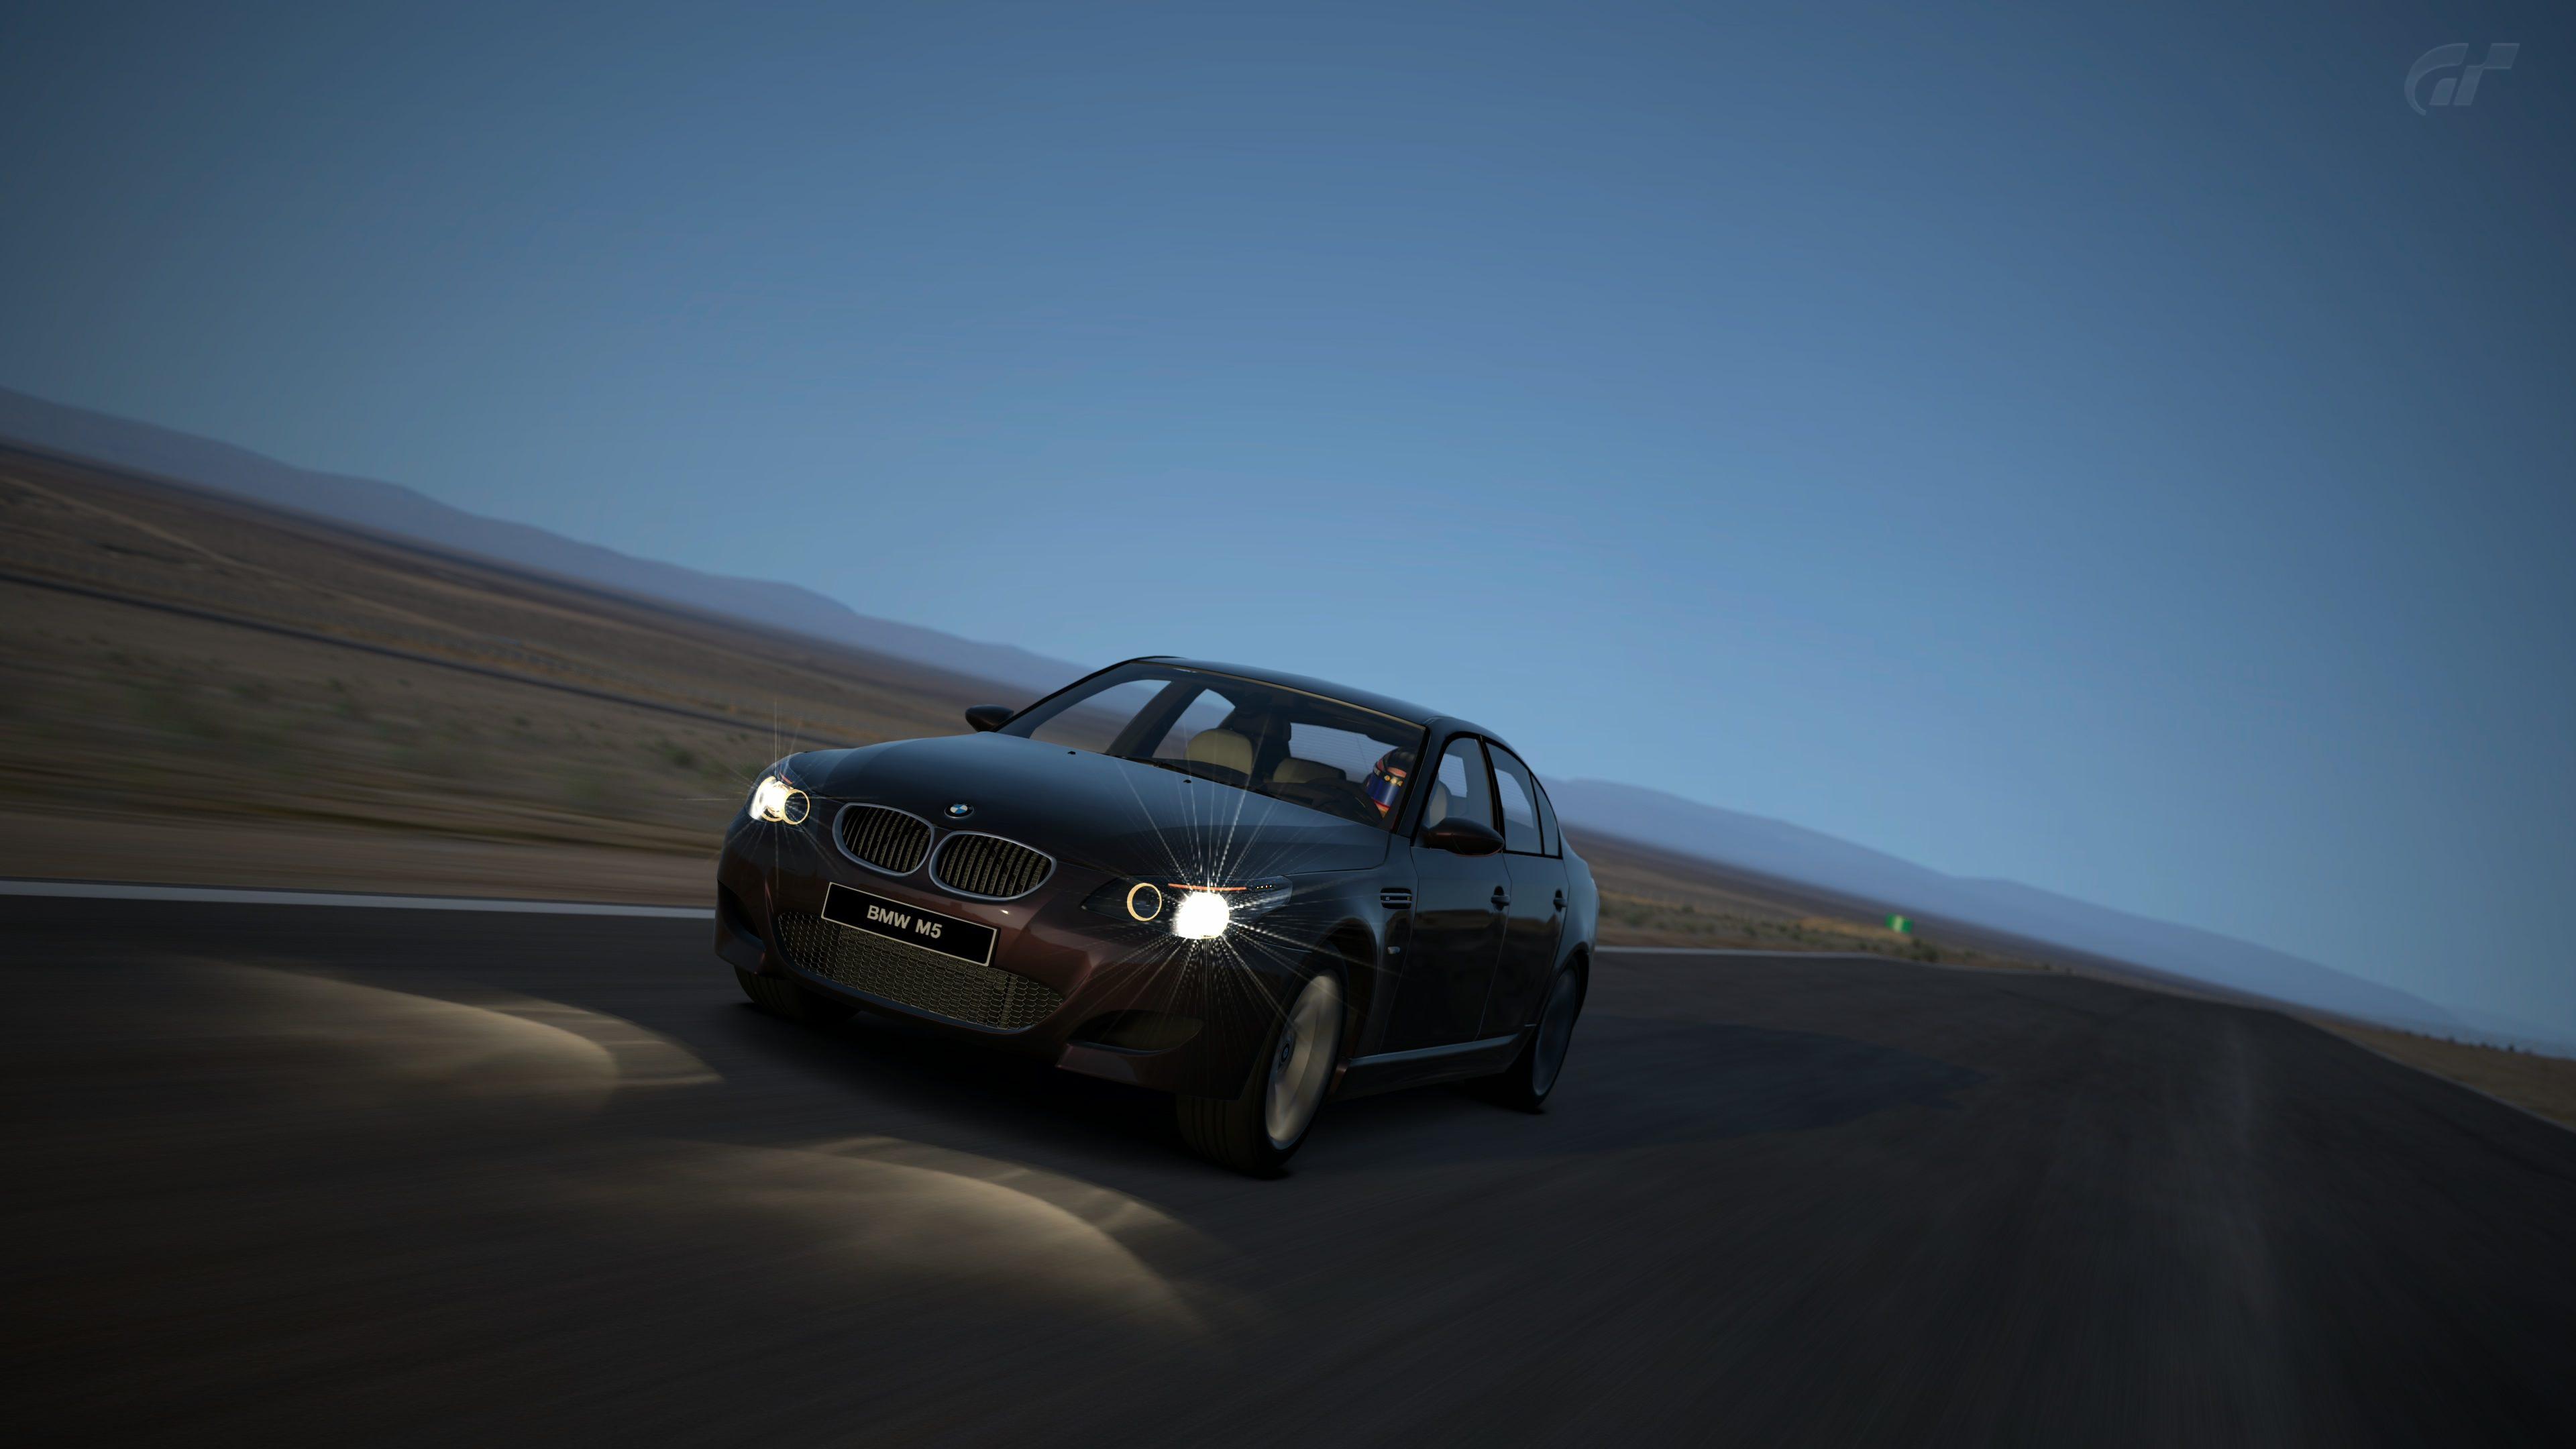 BMW M5 6-Speed '08 (1).jpg